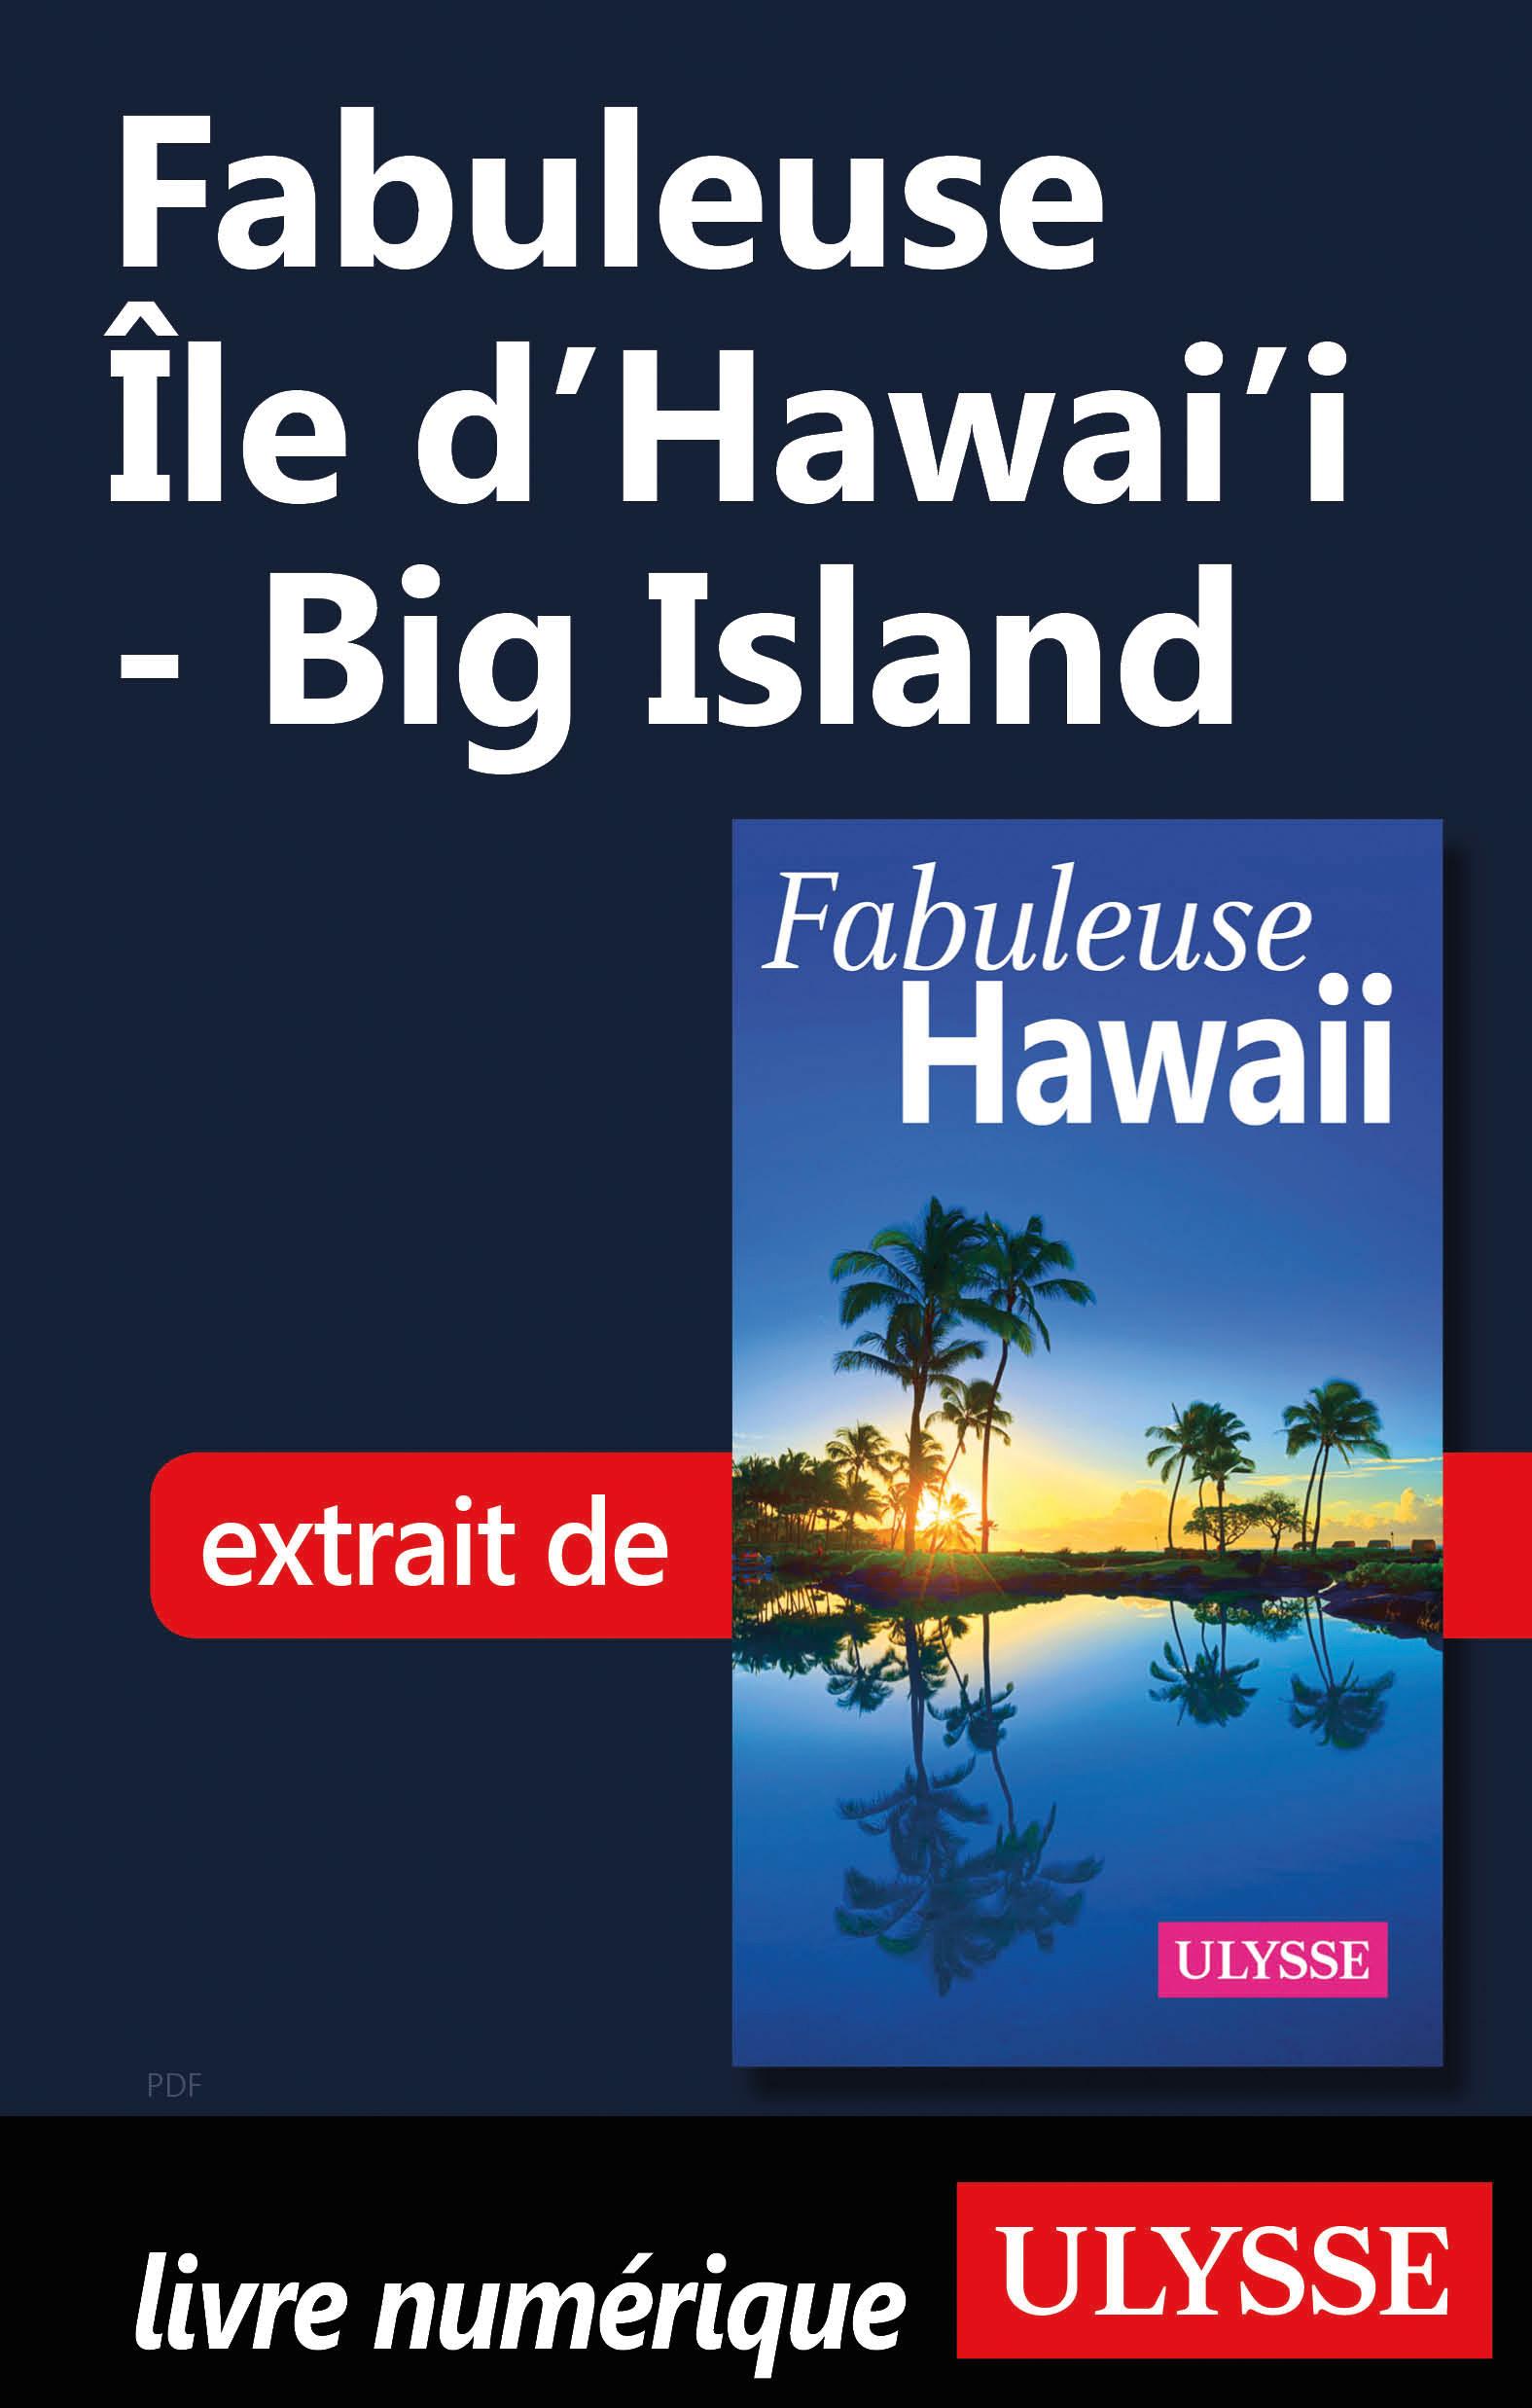 Fabuleuse Île d'Hawai'i - Big Island